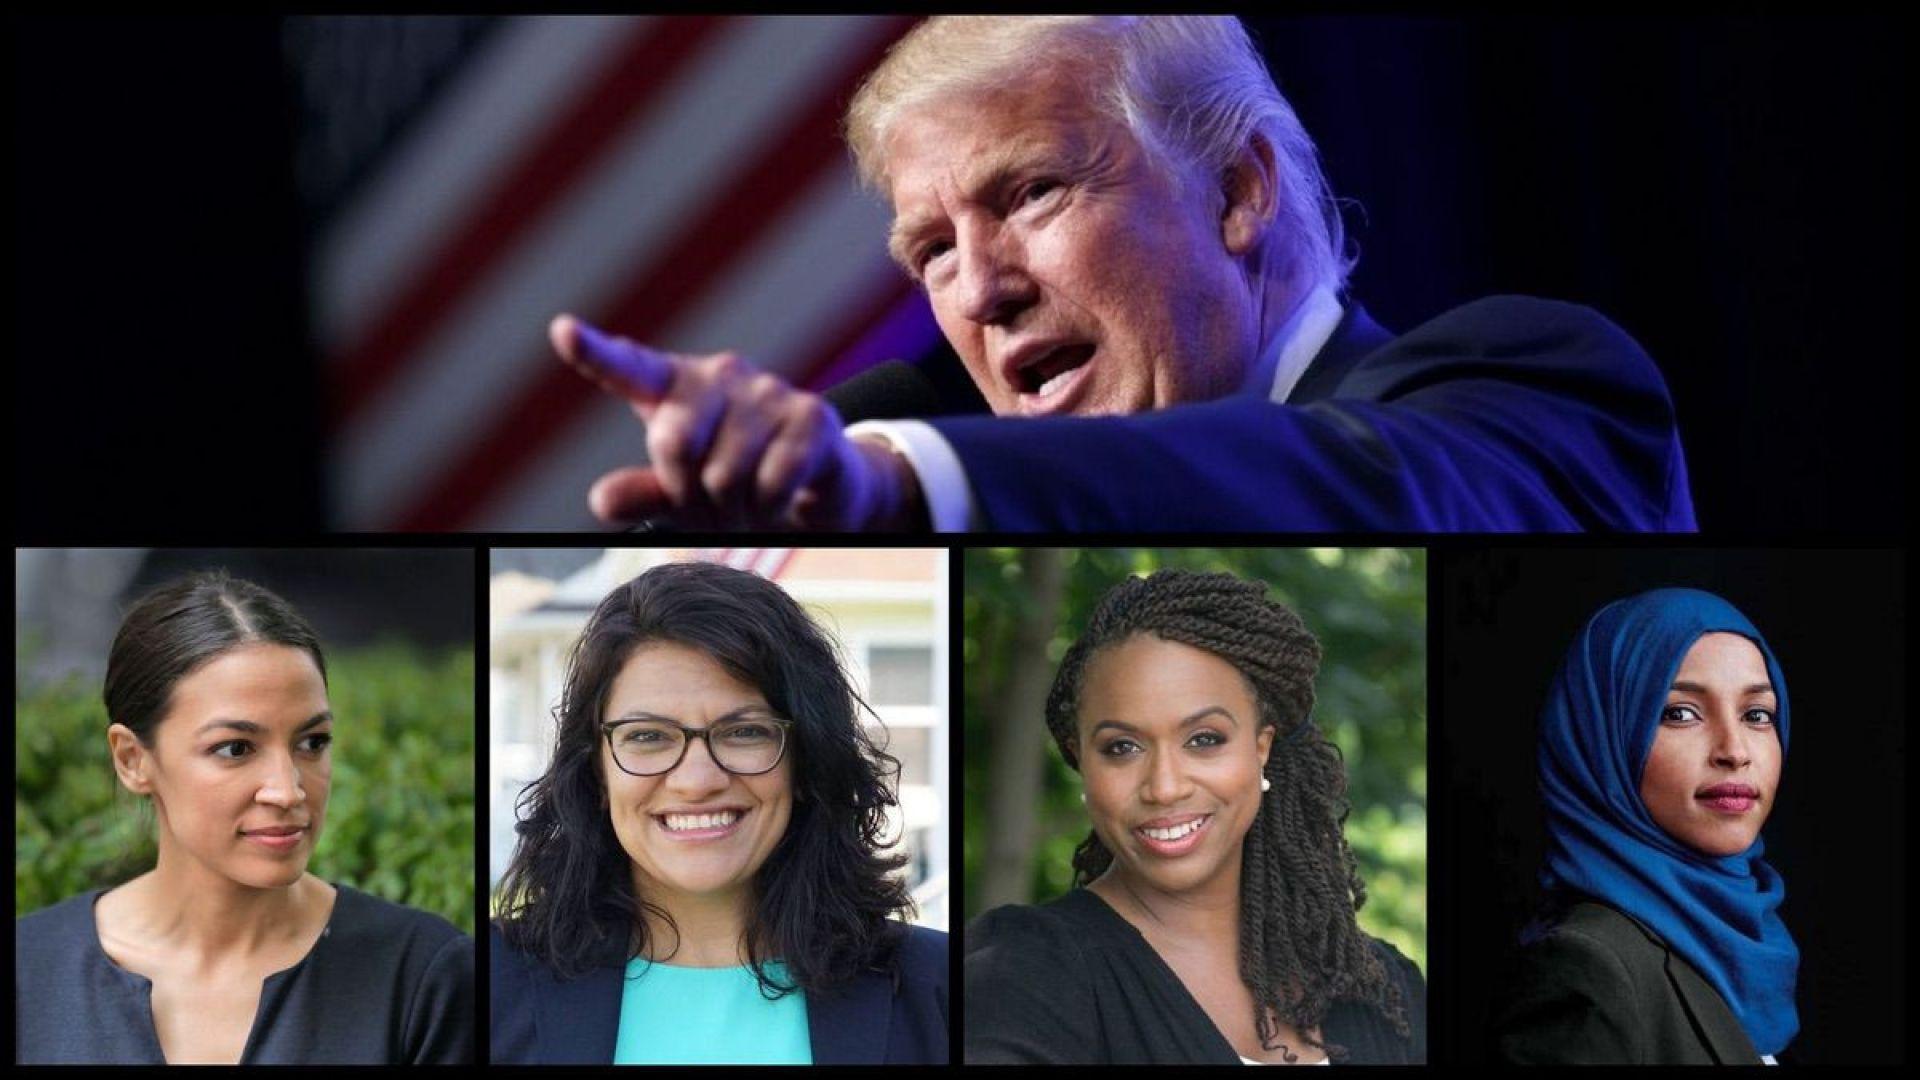 President Trump and Representatives Alexandria Ocasio-Cortez (D-NY), Rashida Tlaib (D-MI), Ayanna Pressley (D-IL), and Ilhan Omar (D-MN).